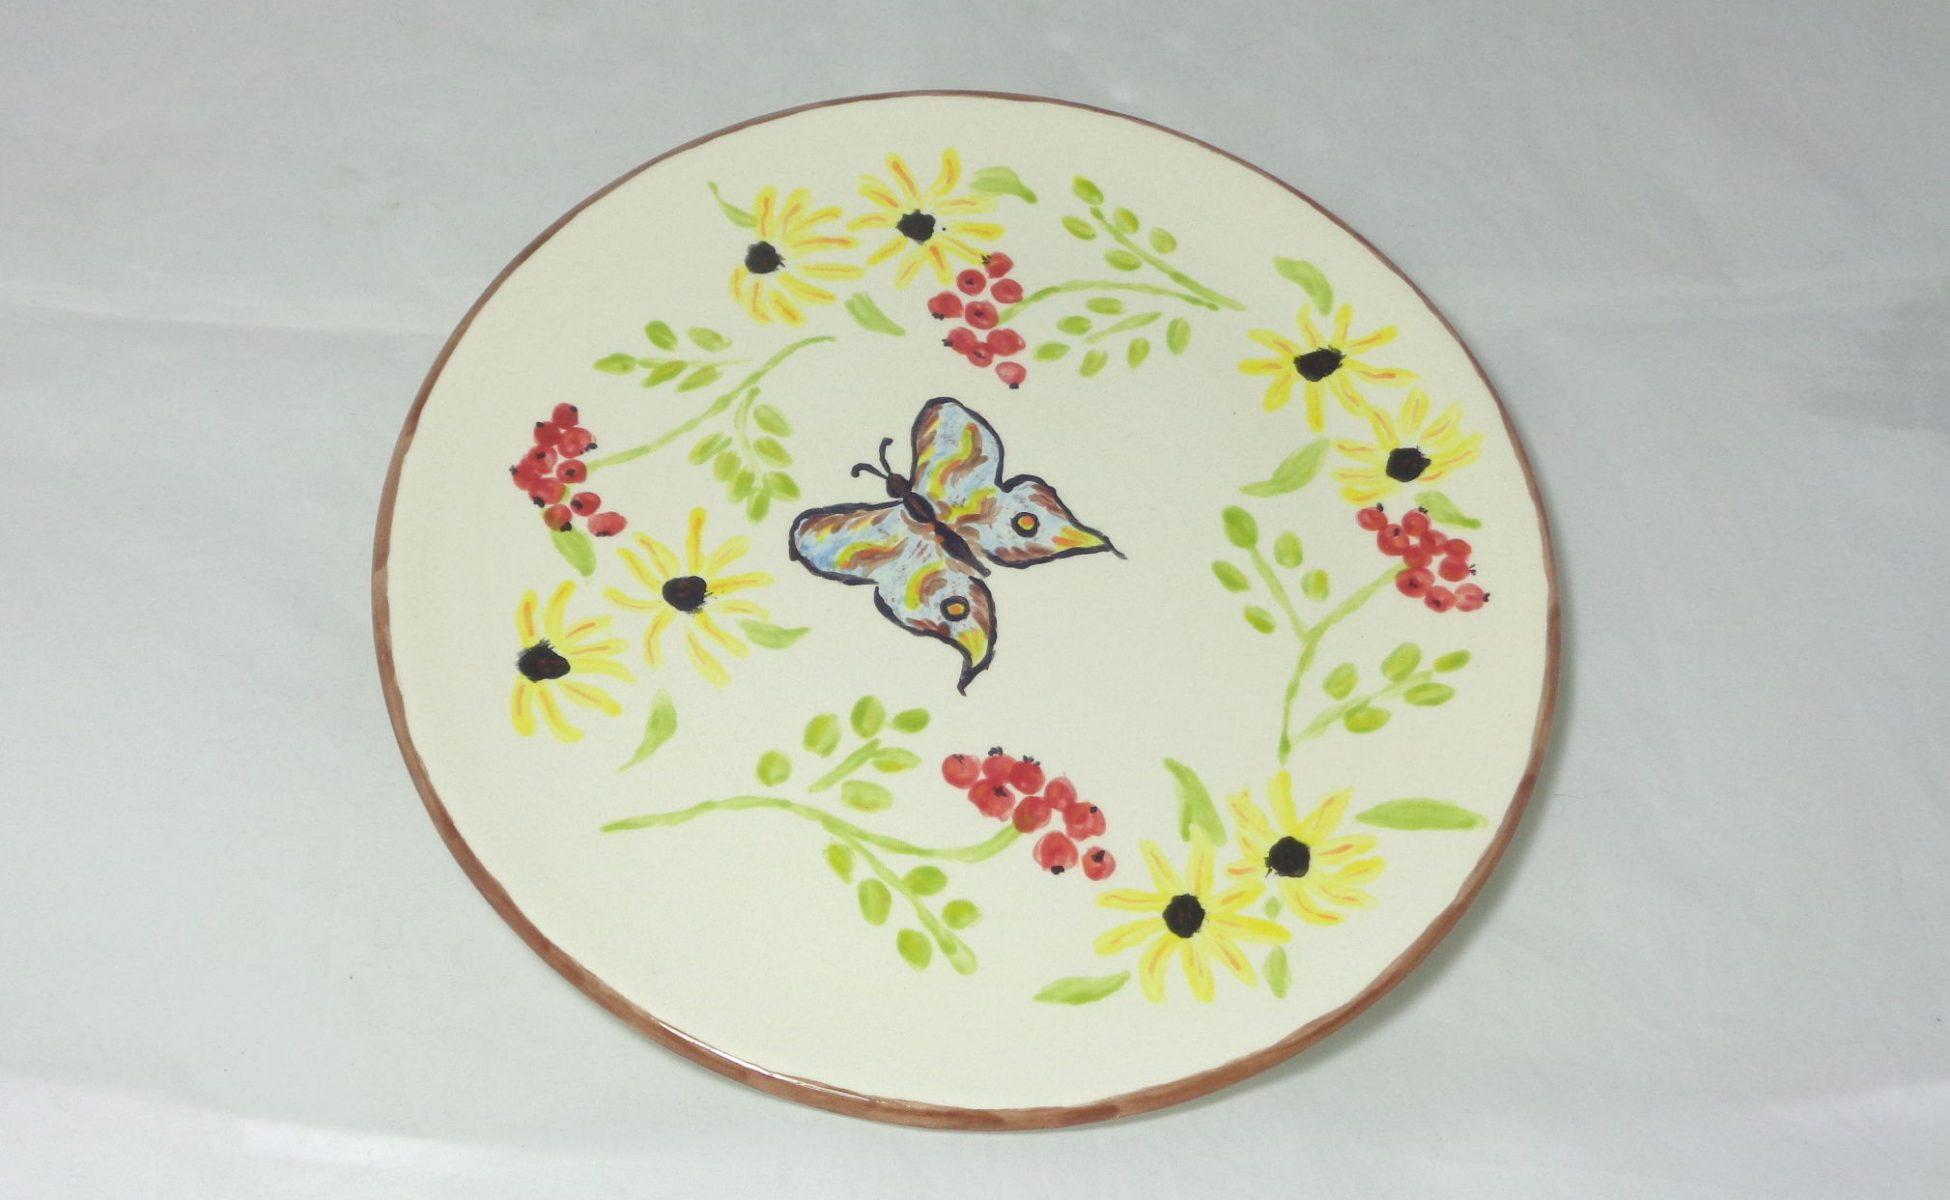 Bemalte Keramik Teller Bauermalerei